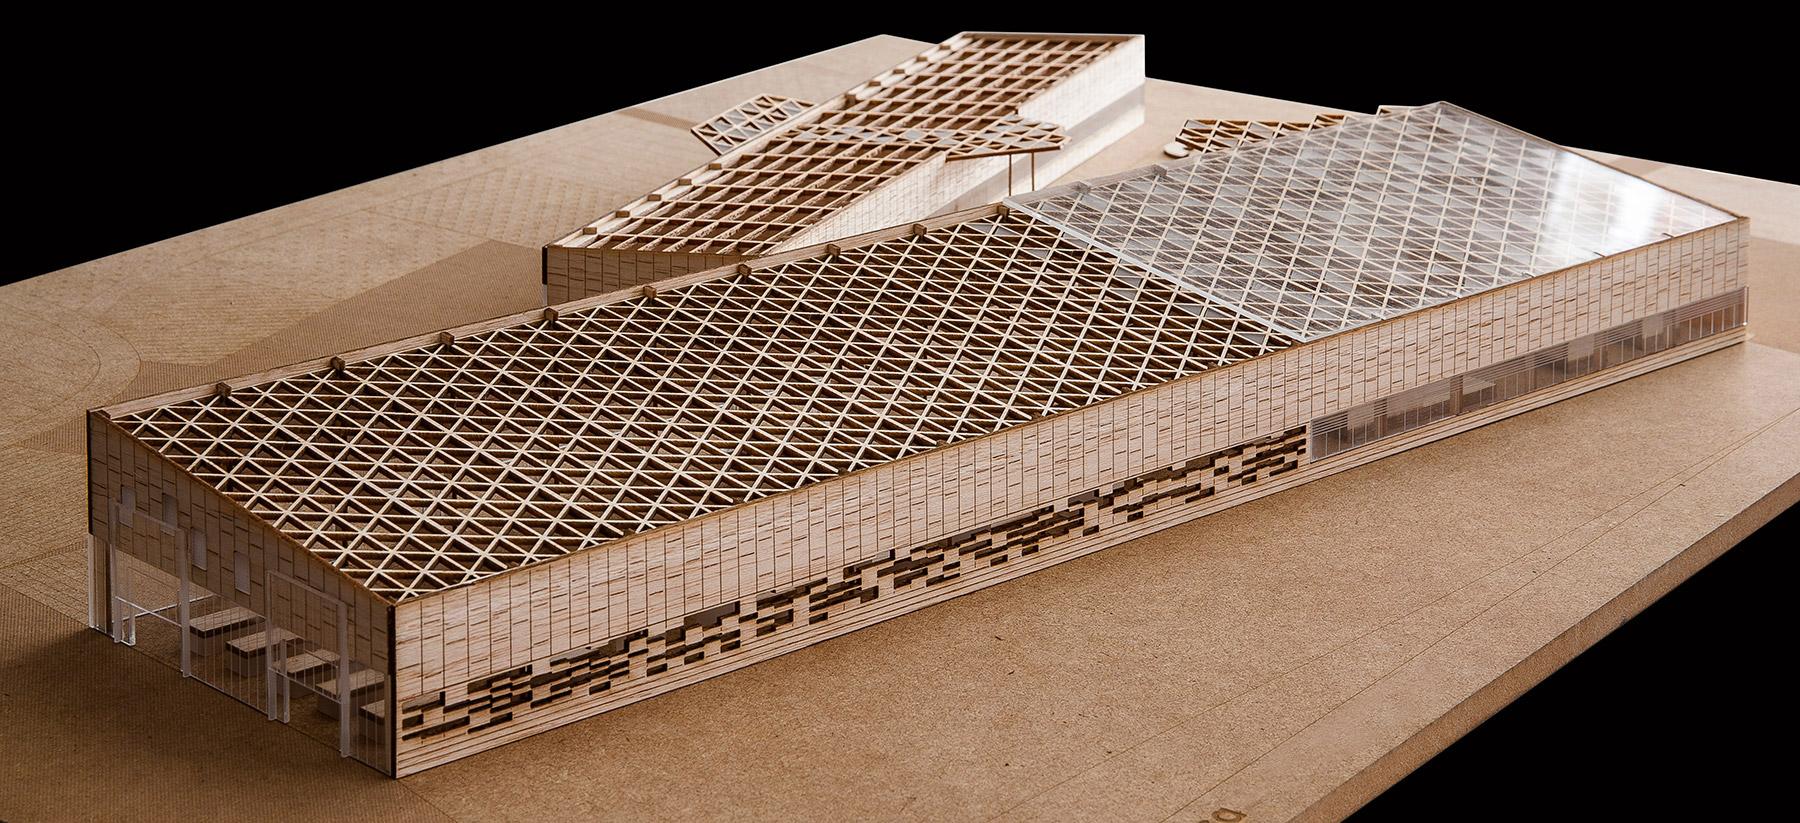 Maqueta arquitectura madera arquimaquetaarquimaqueta - Arquitectura en madera ...